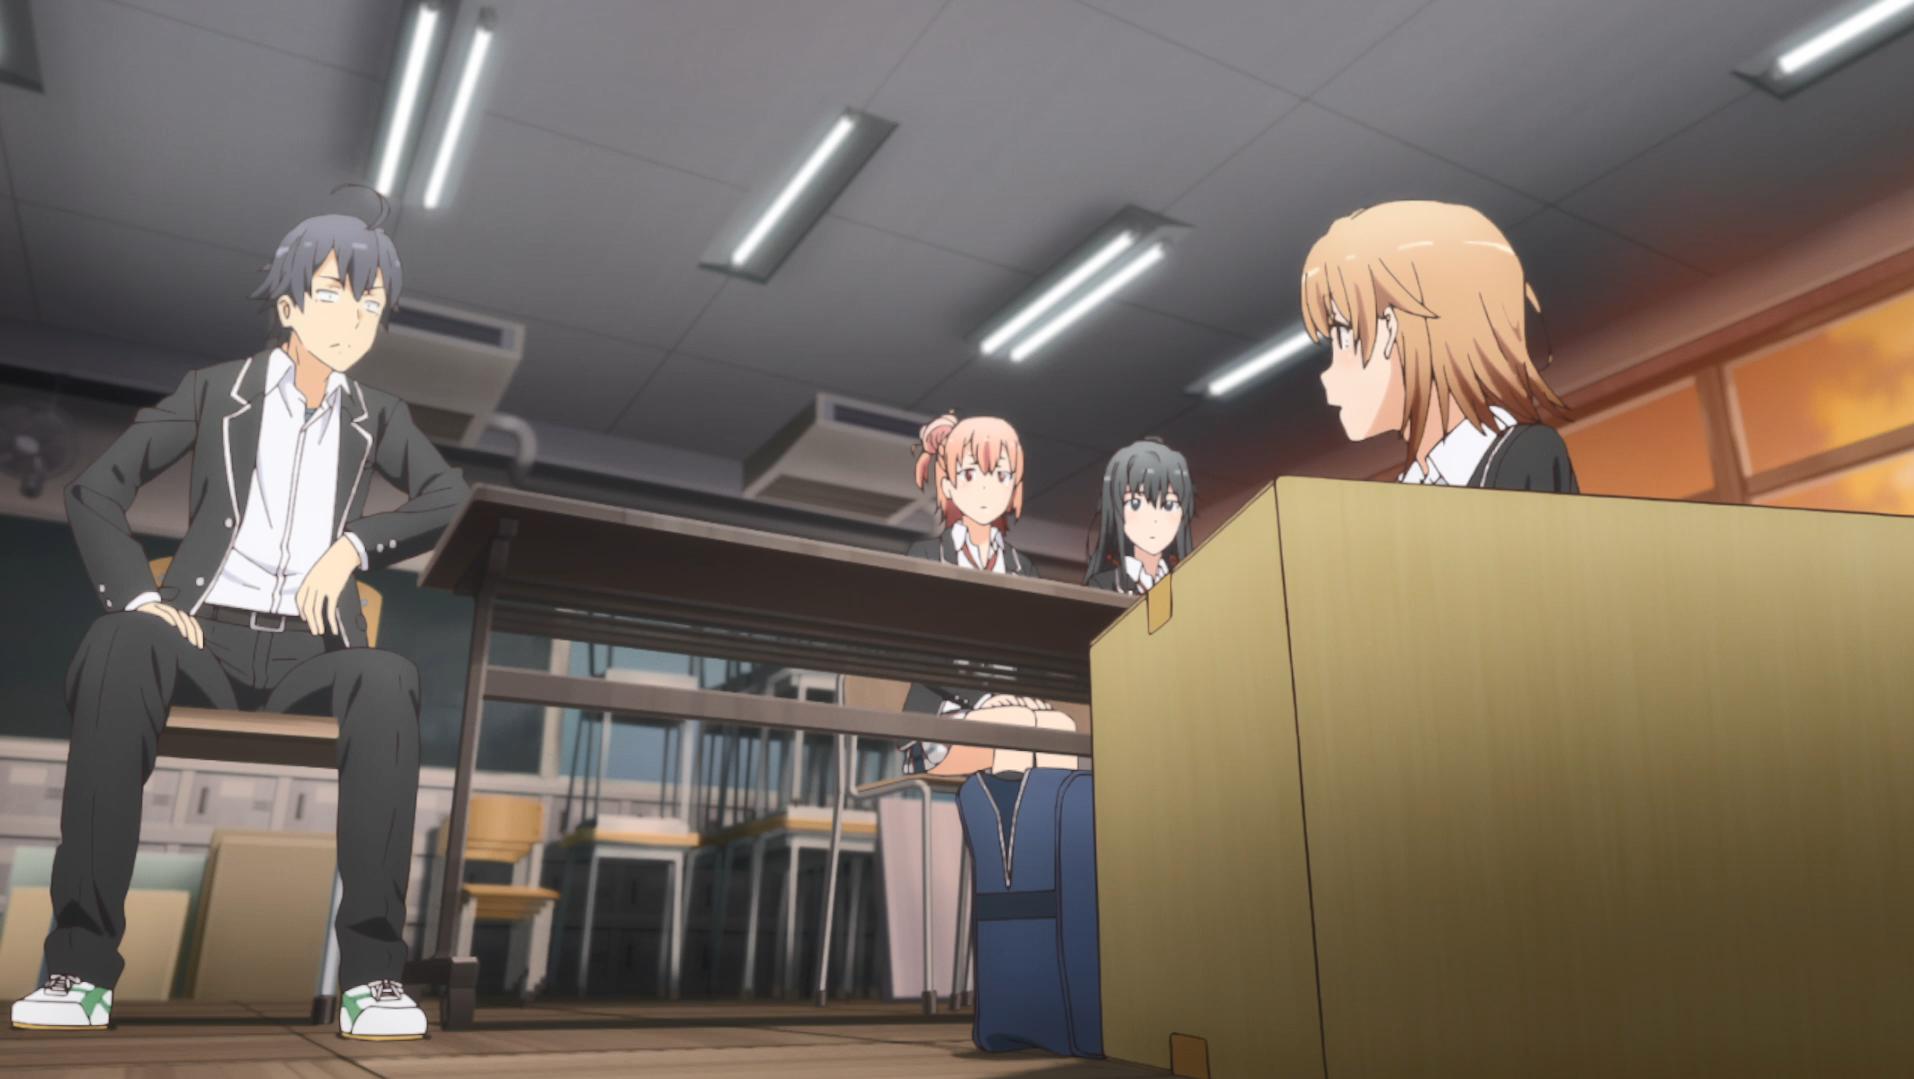 Oregairu Kan_episode 2 Iroha confrontée Hachiman